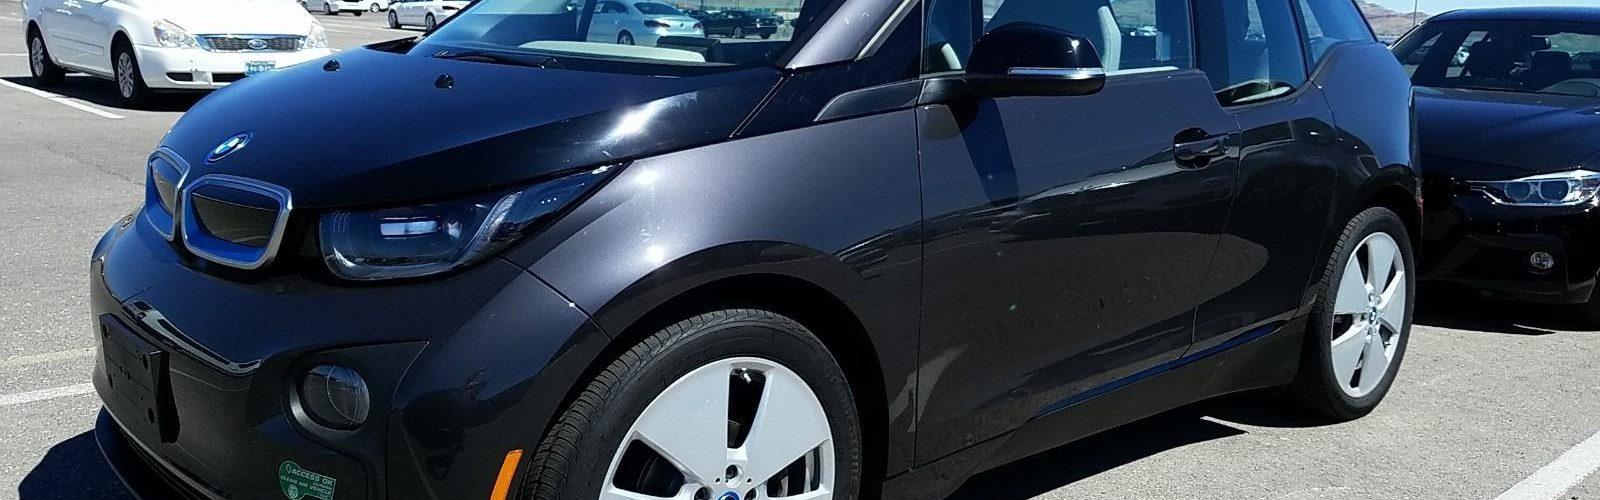 BMW i3 MEGA REXT 2015 – 42 385 Km – Seulement 29 500 $  – VENDU